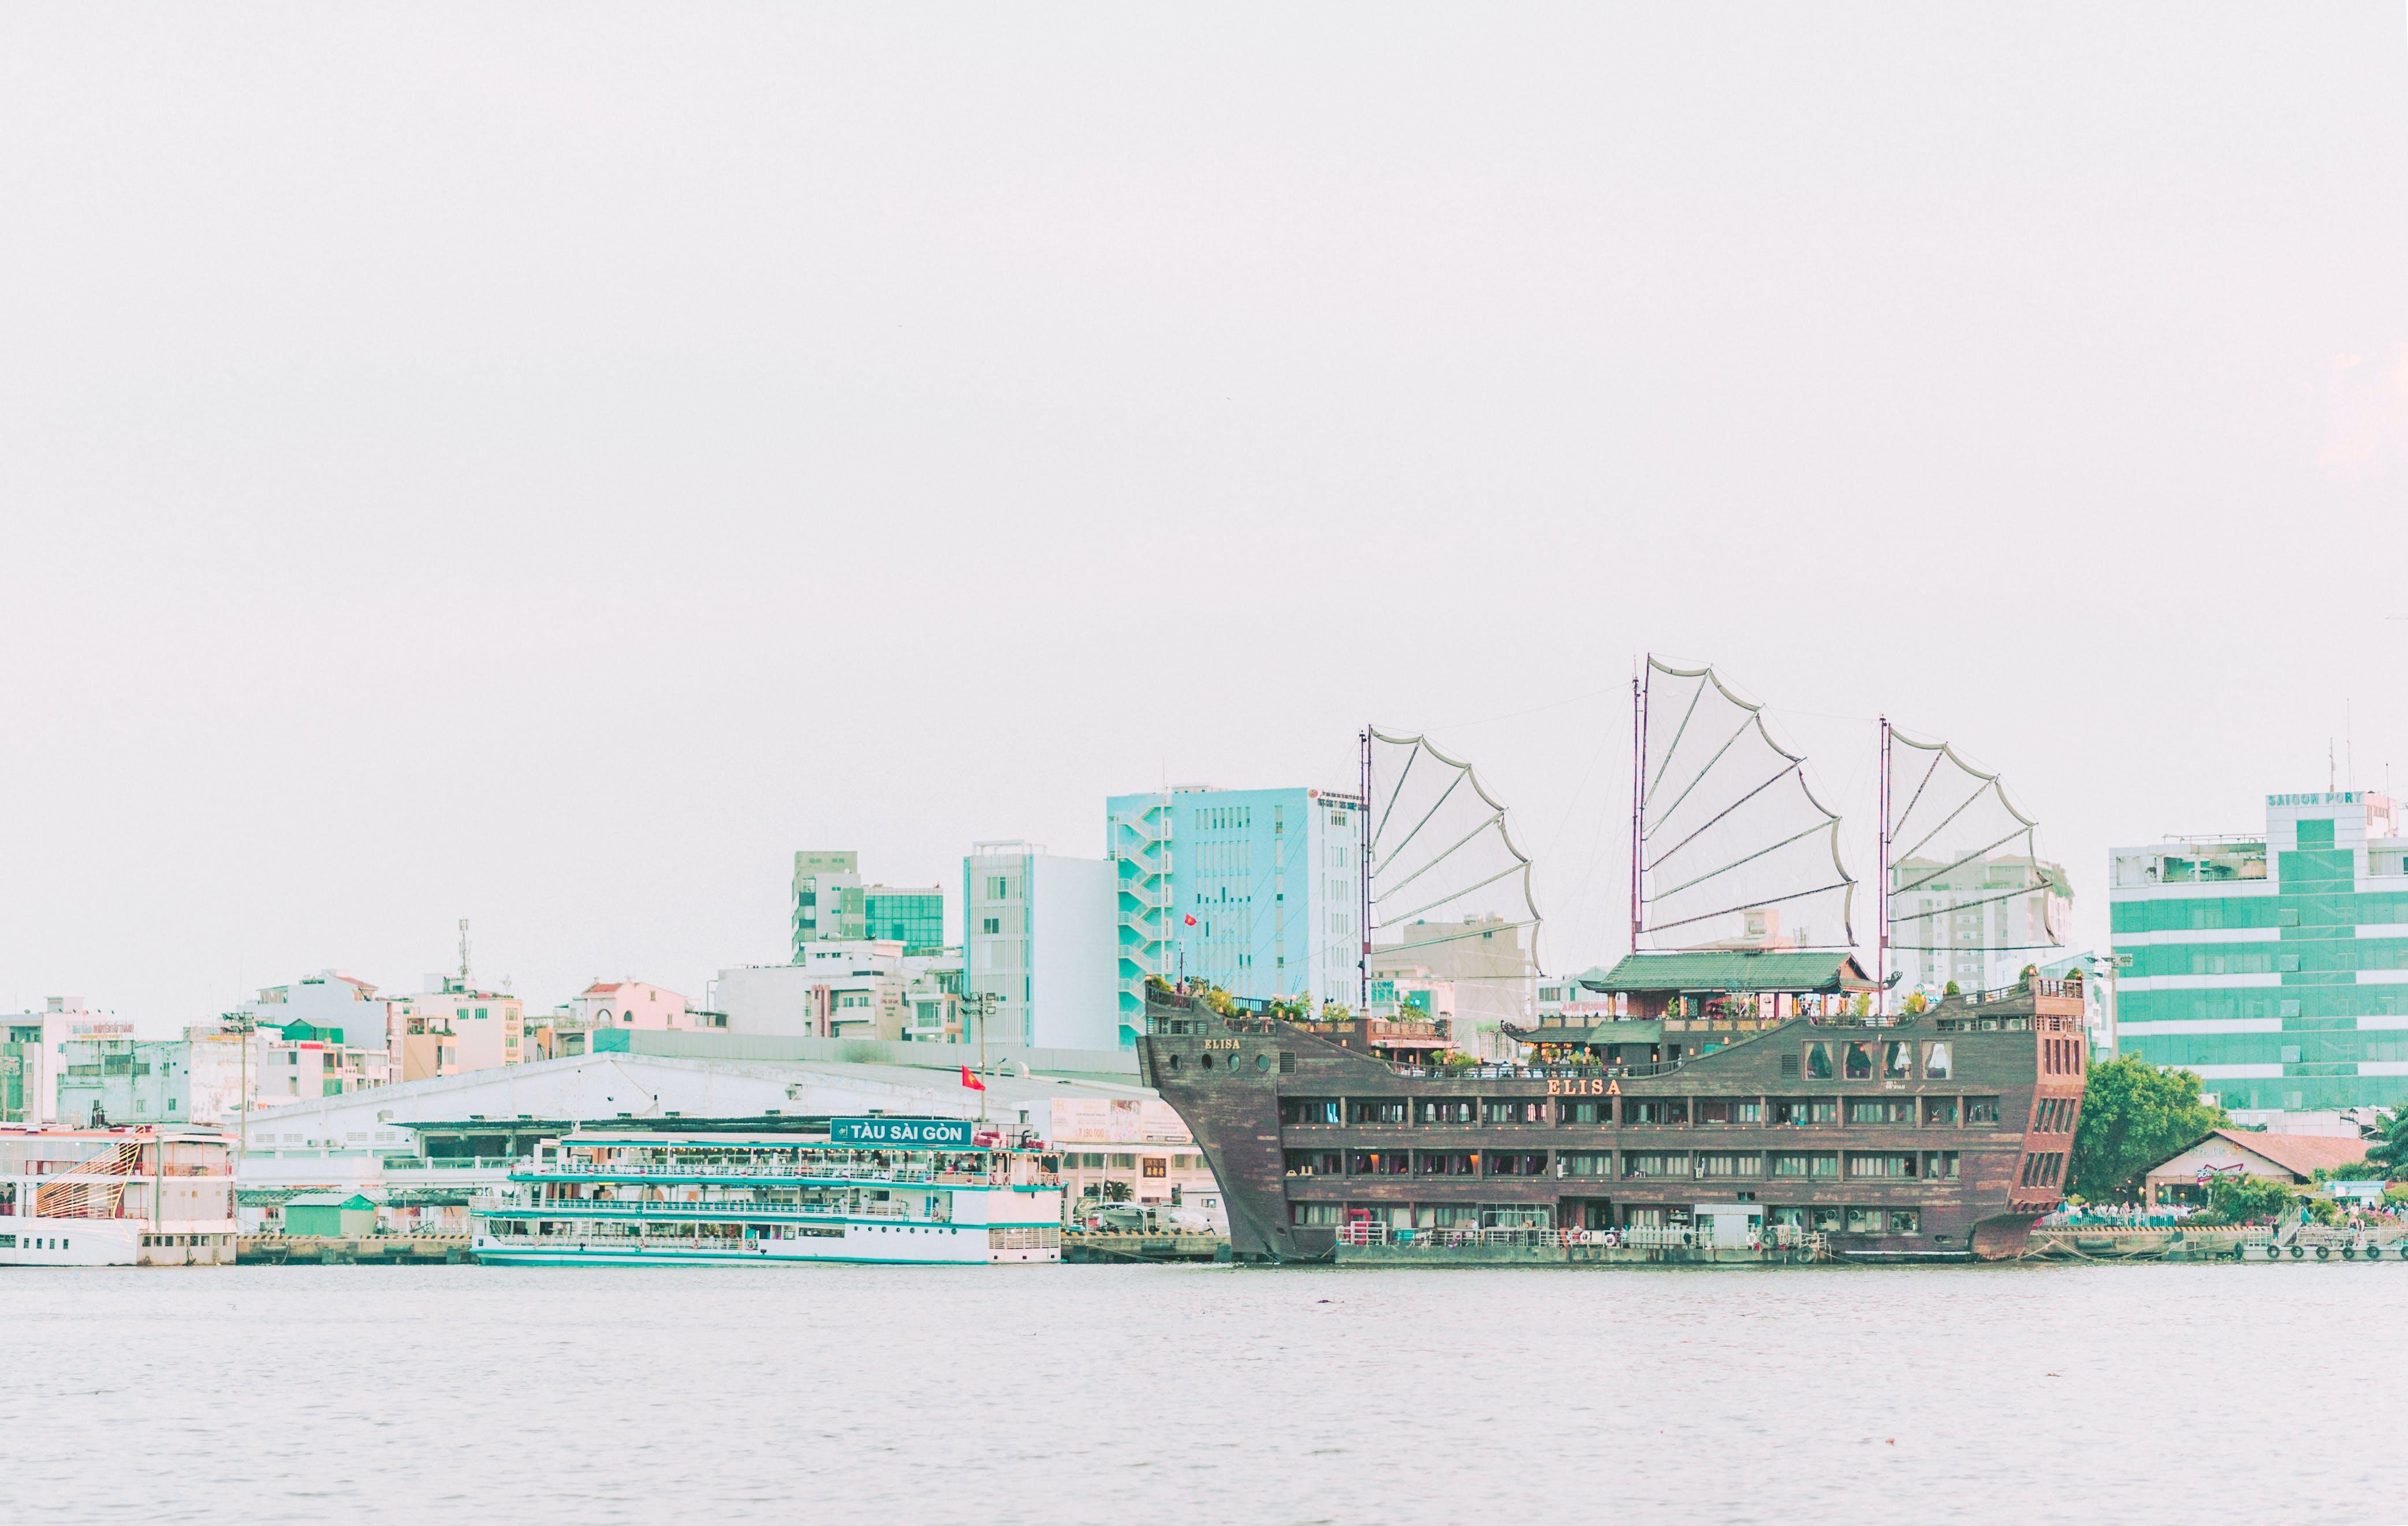 City Buildings Near Body of Water